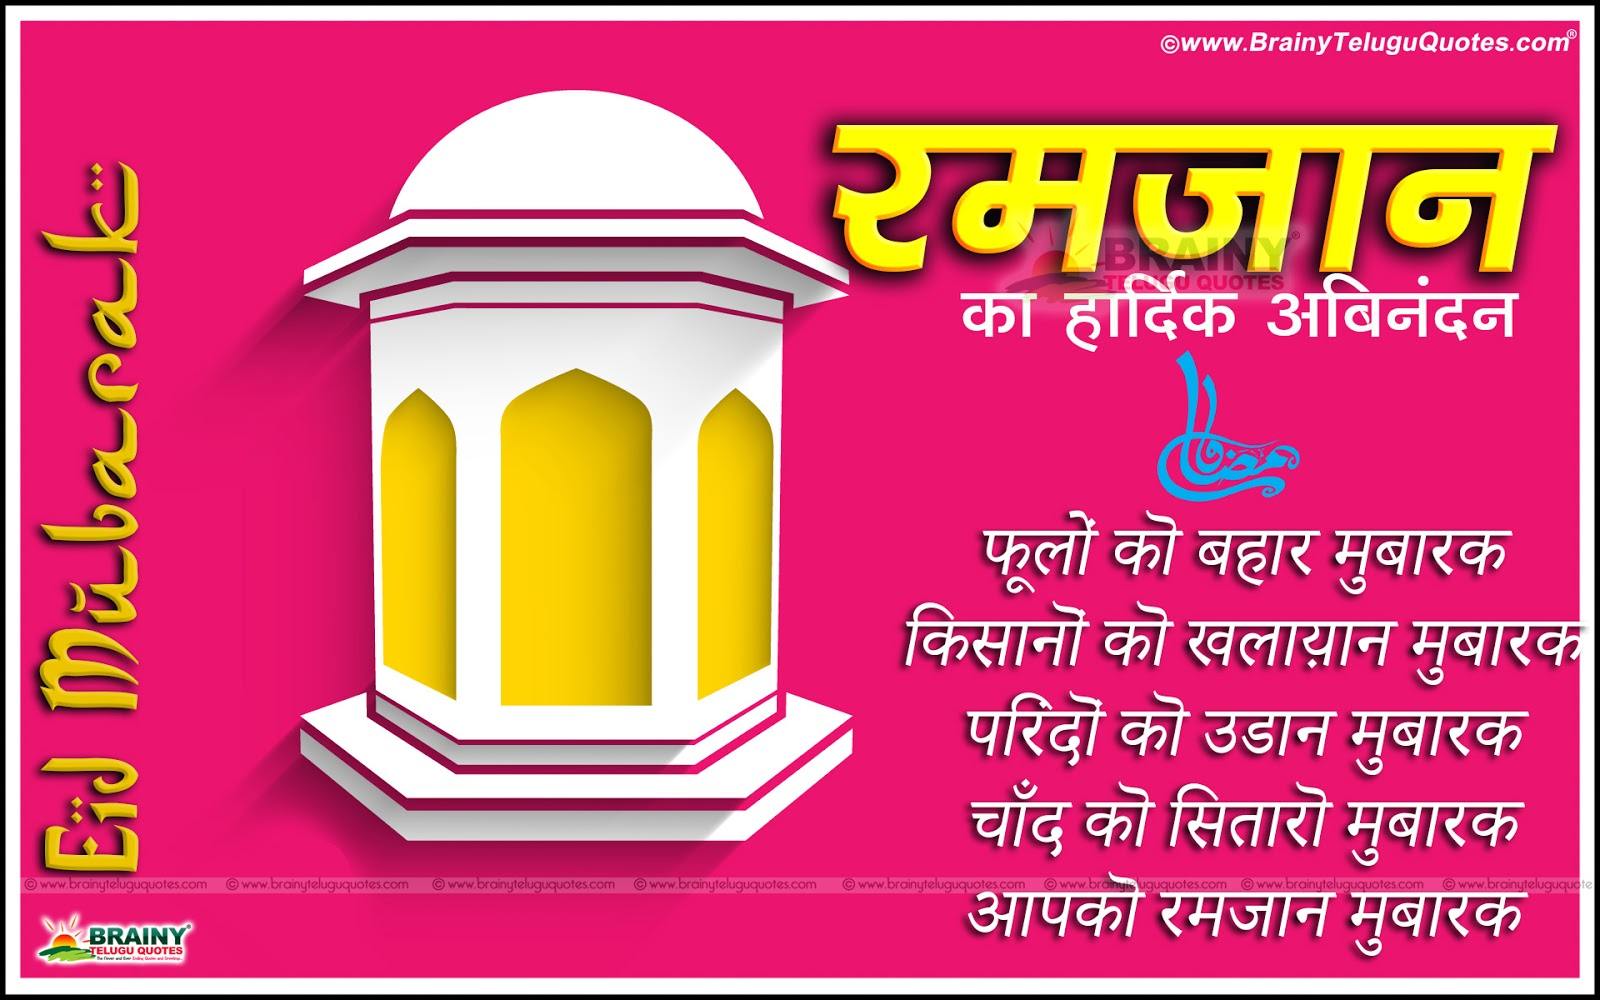 Best hindi ramadan quotes messages brainyteluguquotestelugu 2016 muslims festival ramadan quotes in hindi font hindi nice ramadan backgrounds hindi ramadan m4hsunfo